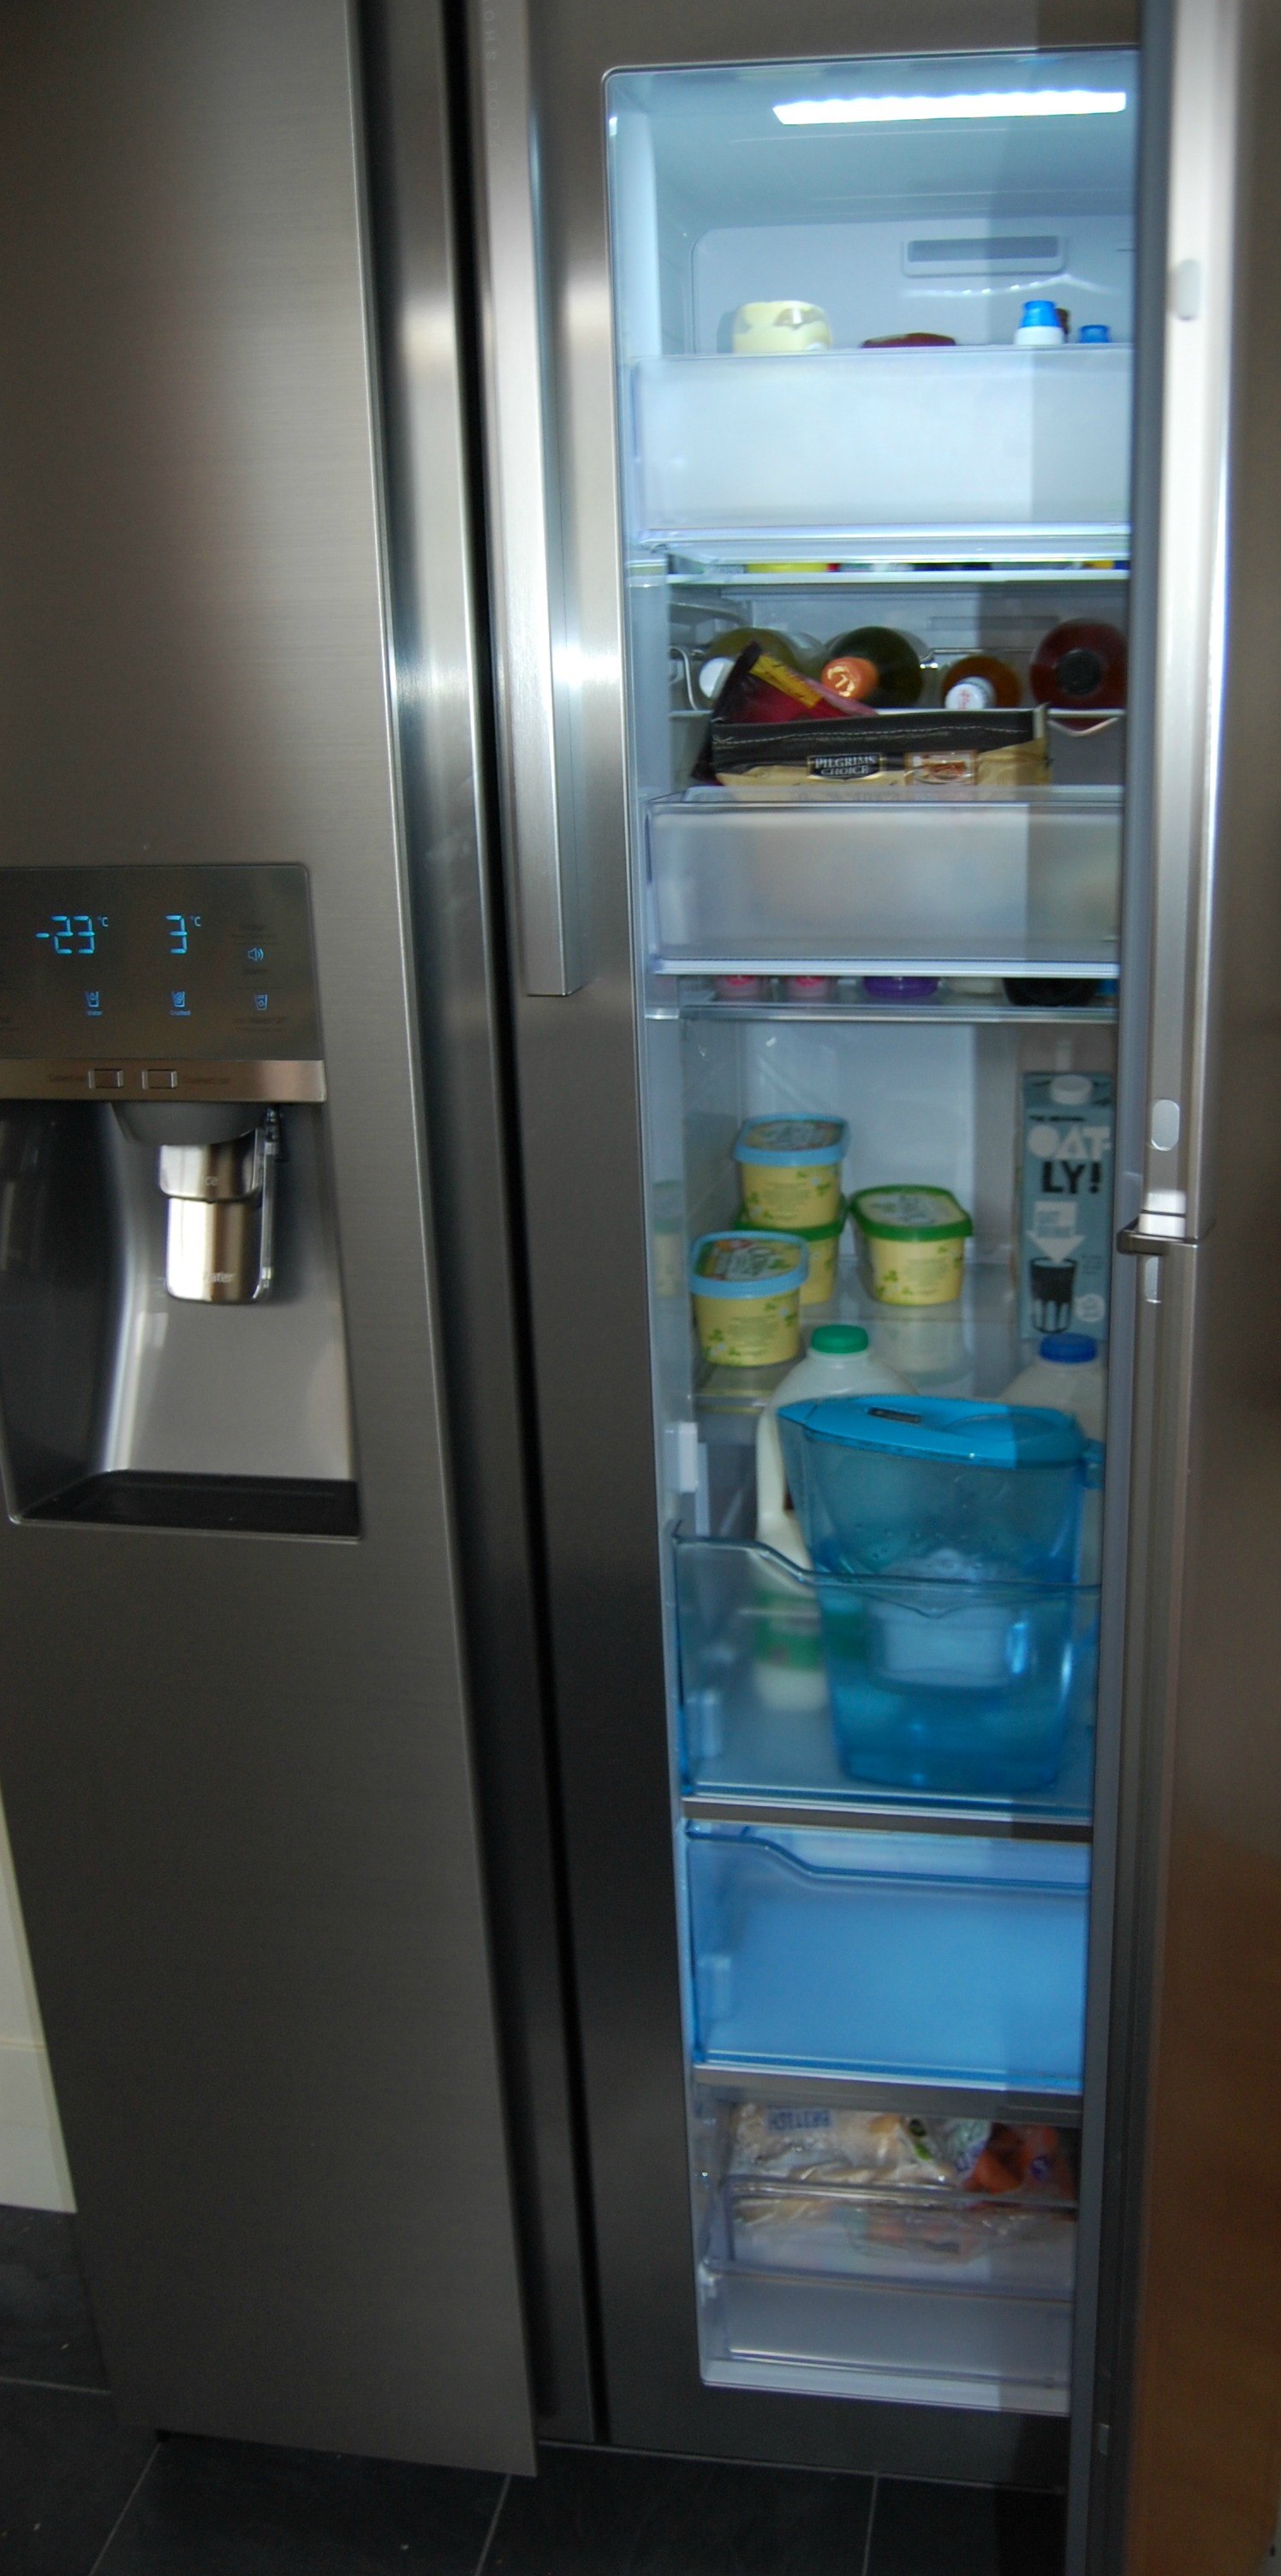 Samsung Foodshowcase Fridge Freezer Review First